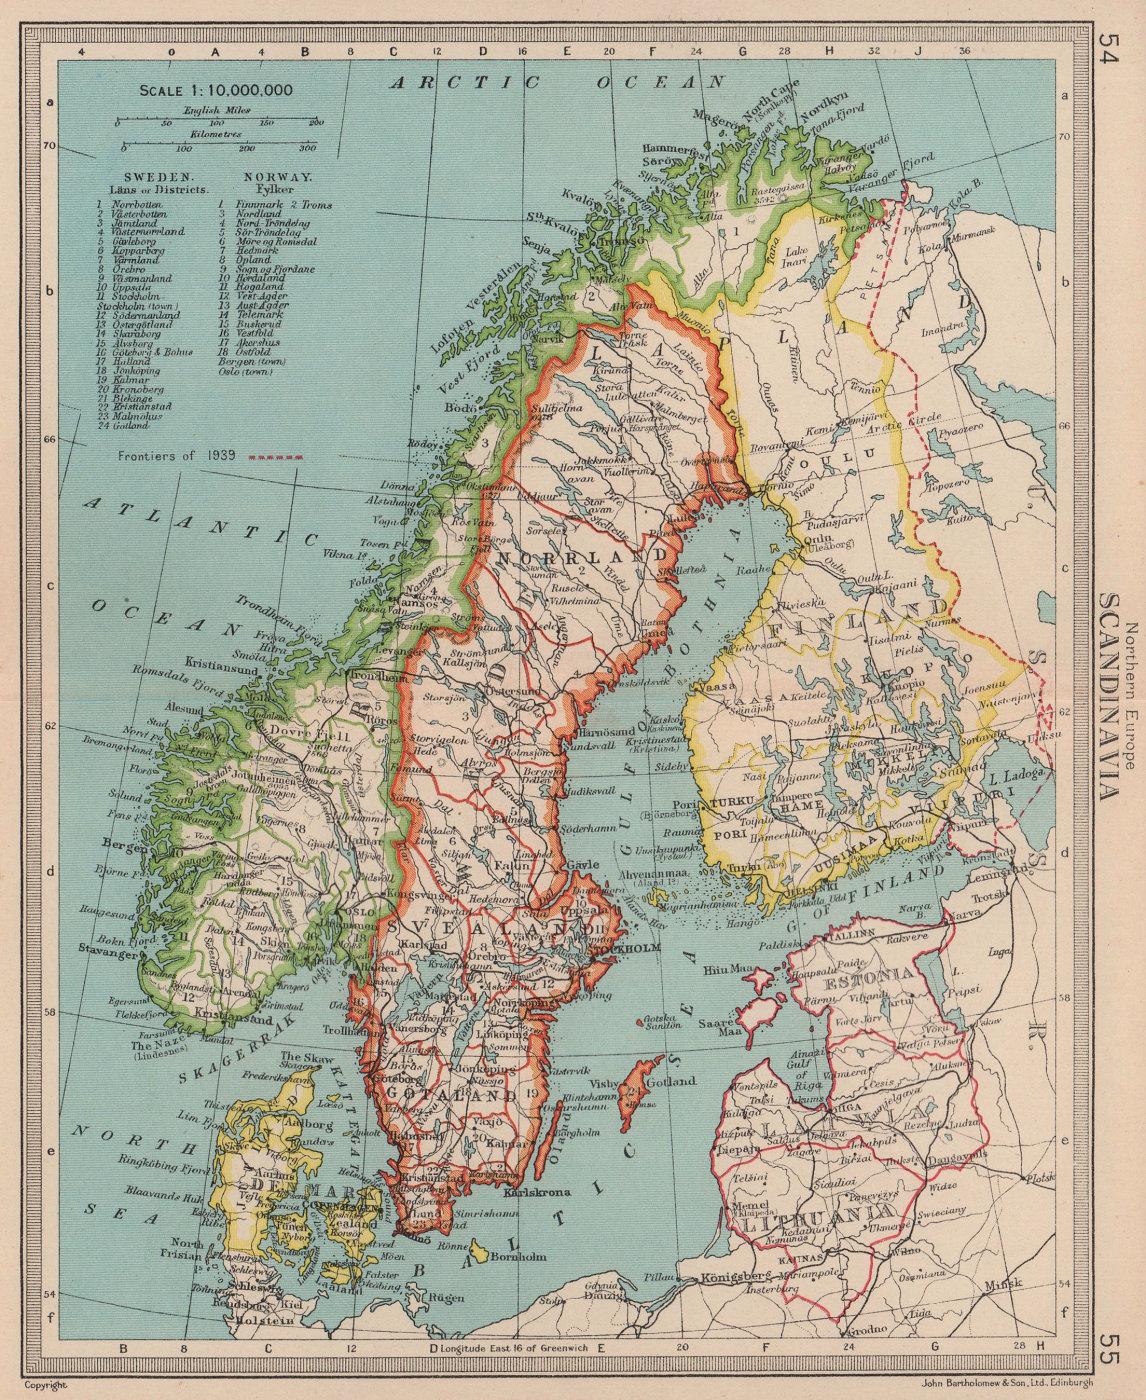 Scandinavia. Nordics. Sweden Norway Finland 1939 frontiers. BARTHOLOMEW 1949 map